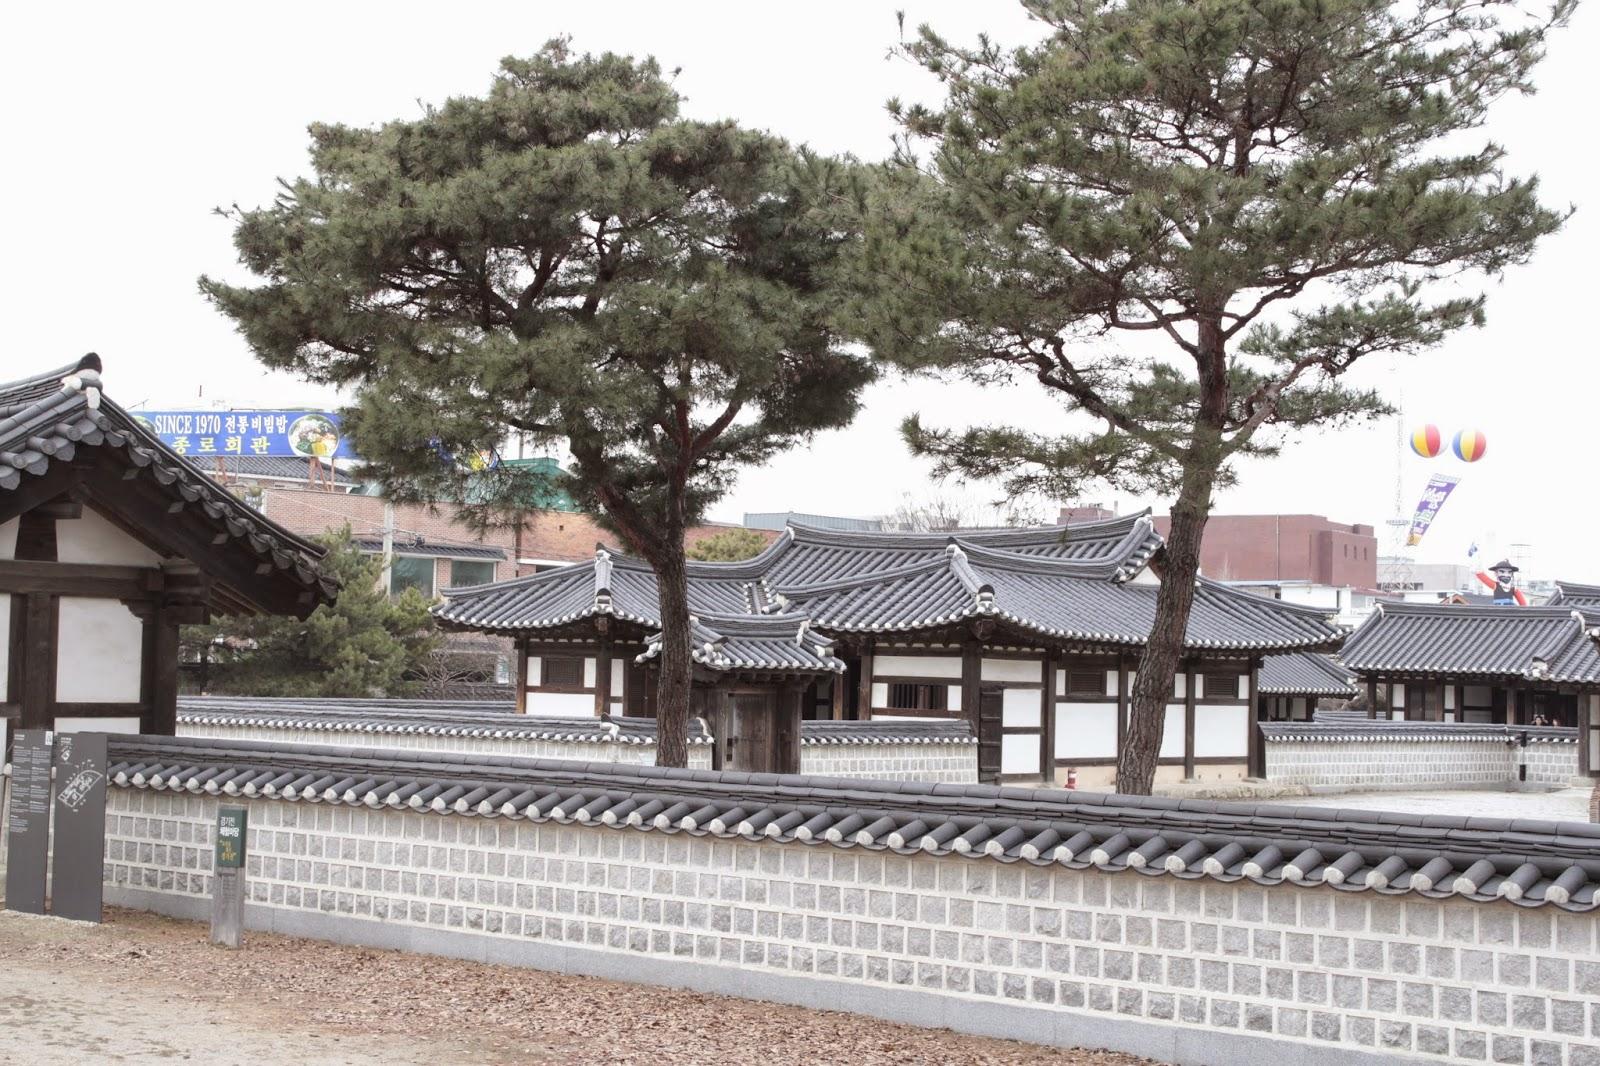 The Jeonju Hanok Village  Uc804 Uc8fc Ud55c Uc625 Ub9c8 Uc744